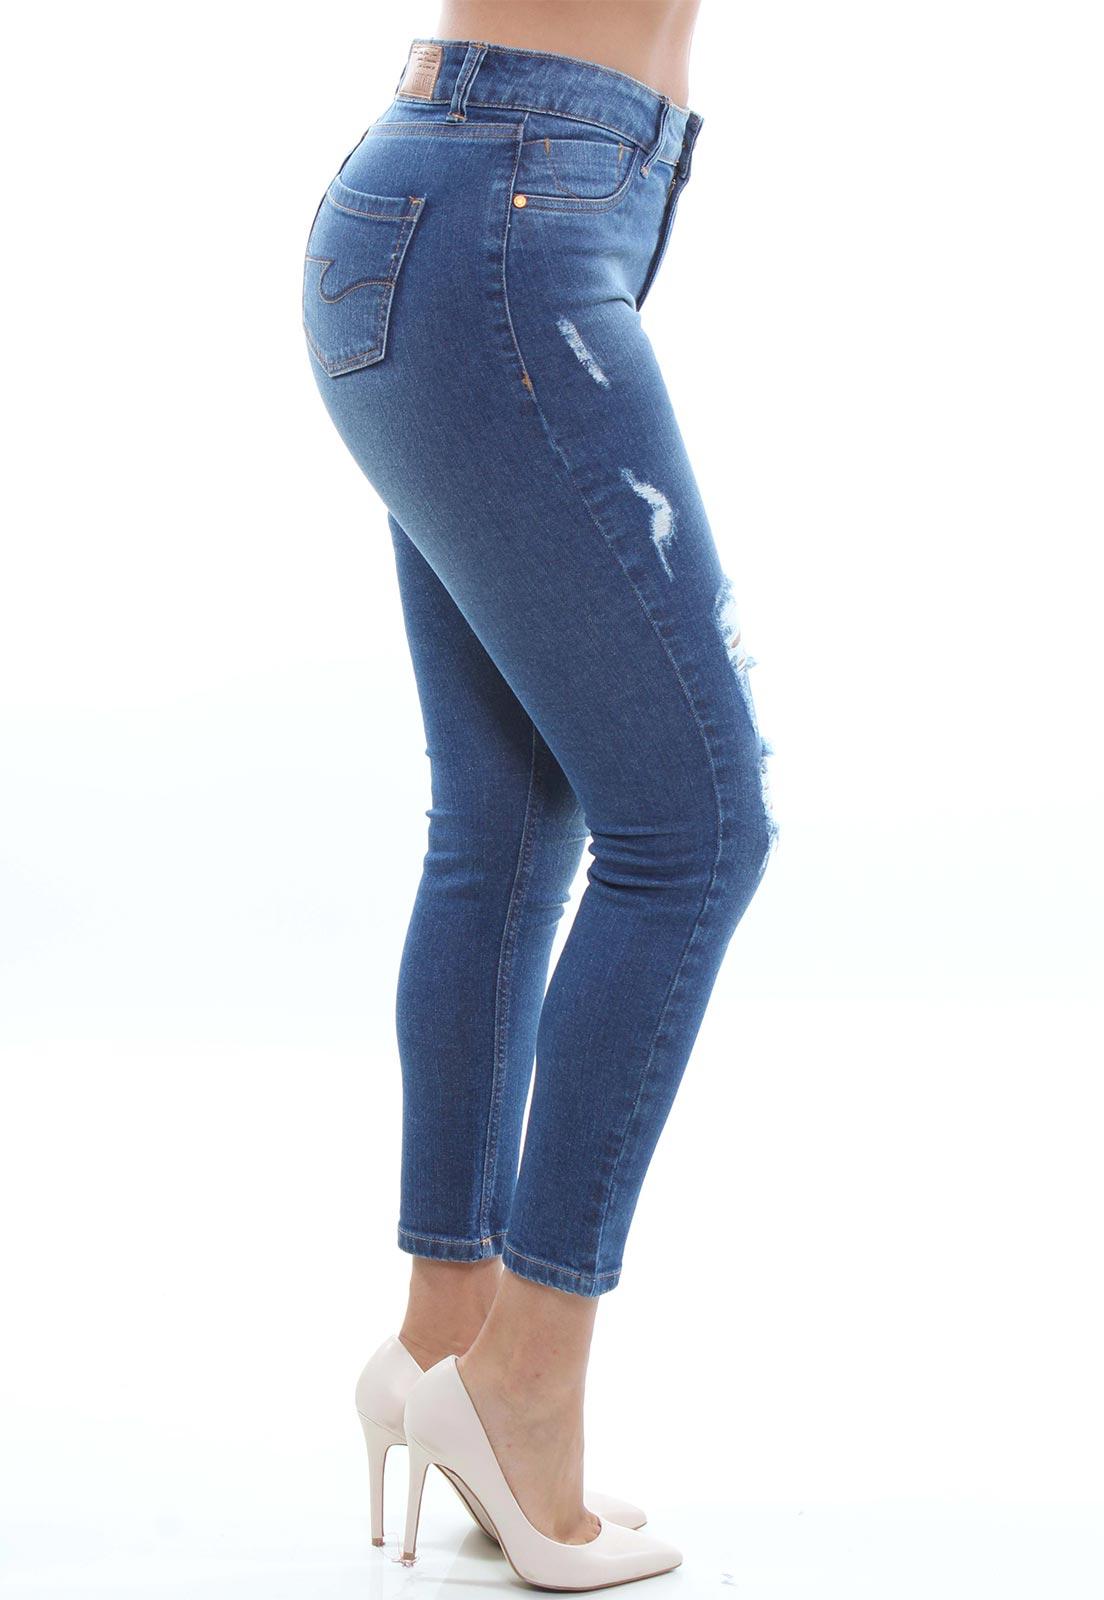 Calça Jeans Feminina Skinny Crocker - 47980  - CROCKER JEANS